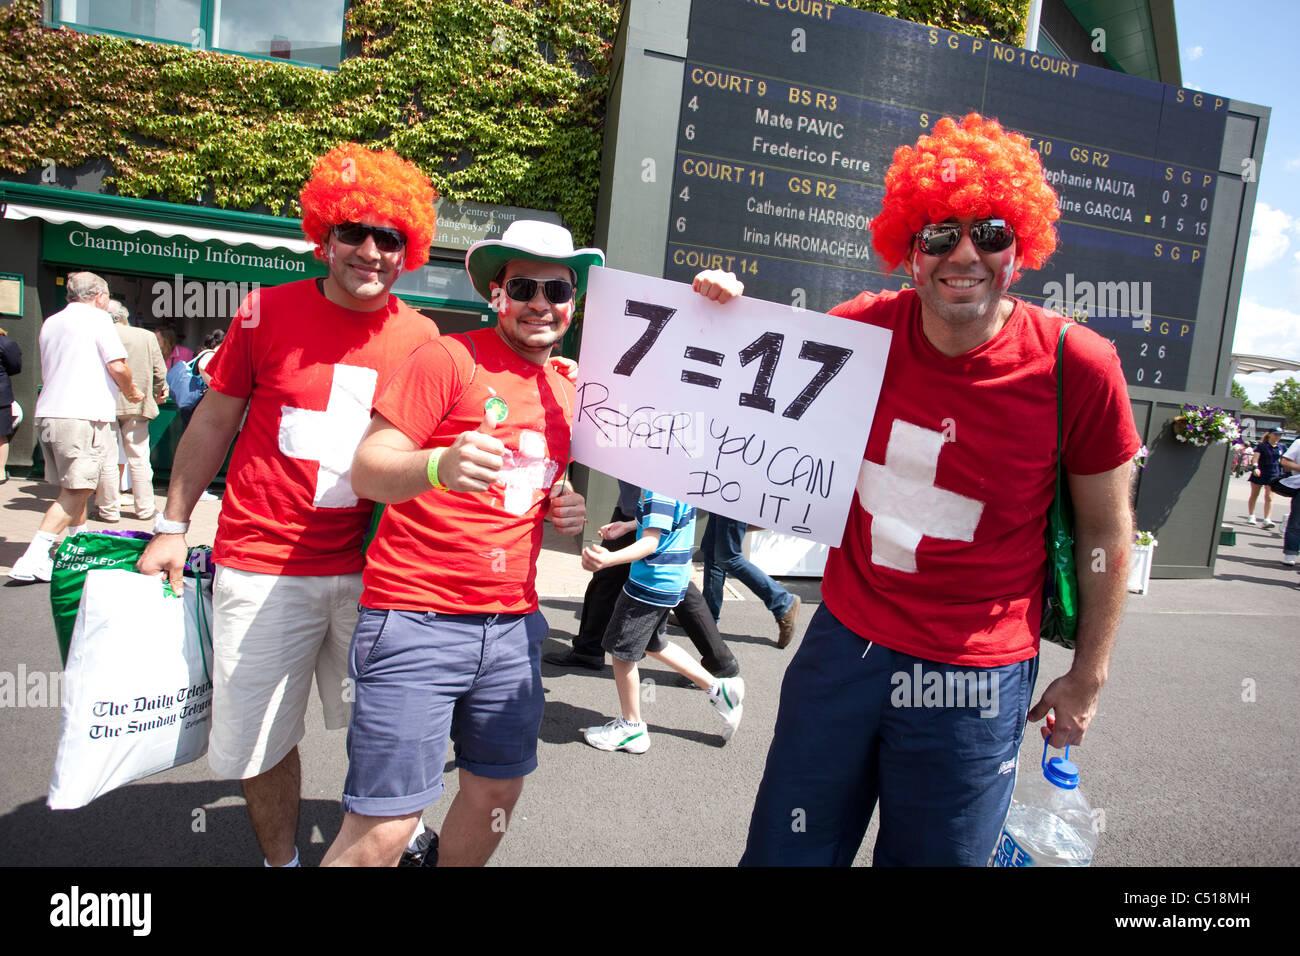 Swiss Roger Federer fans at The Wimbledon Tennis Championships, Wimbledon, London, United Kingdom.Photo:Jeff Gilbert Stock Photo